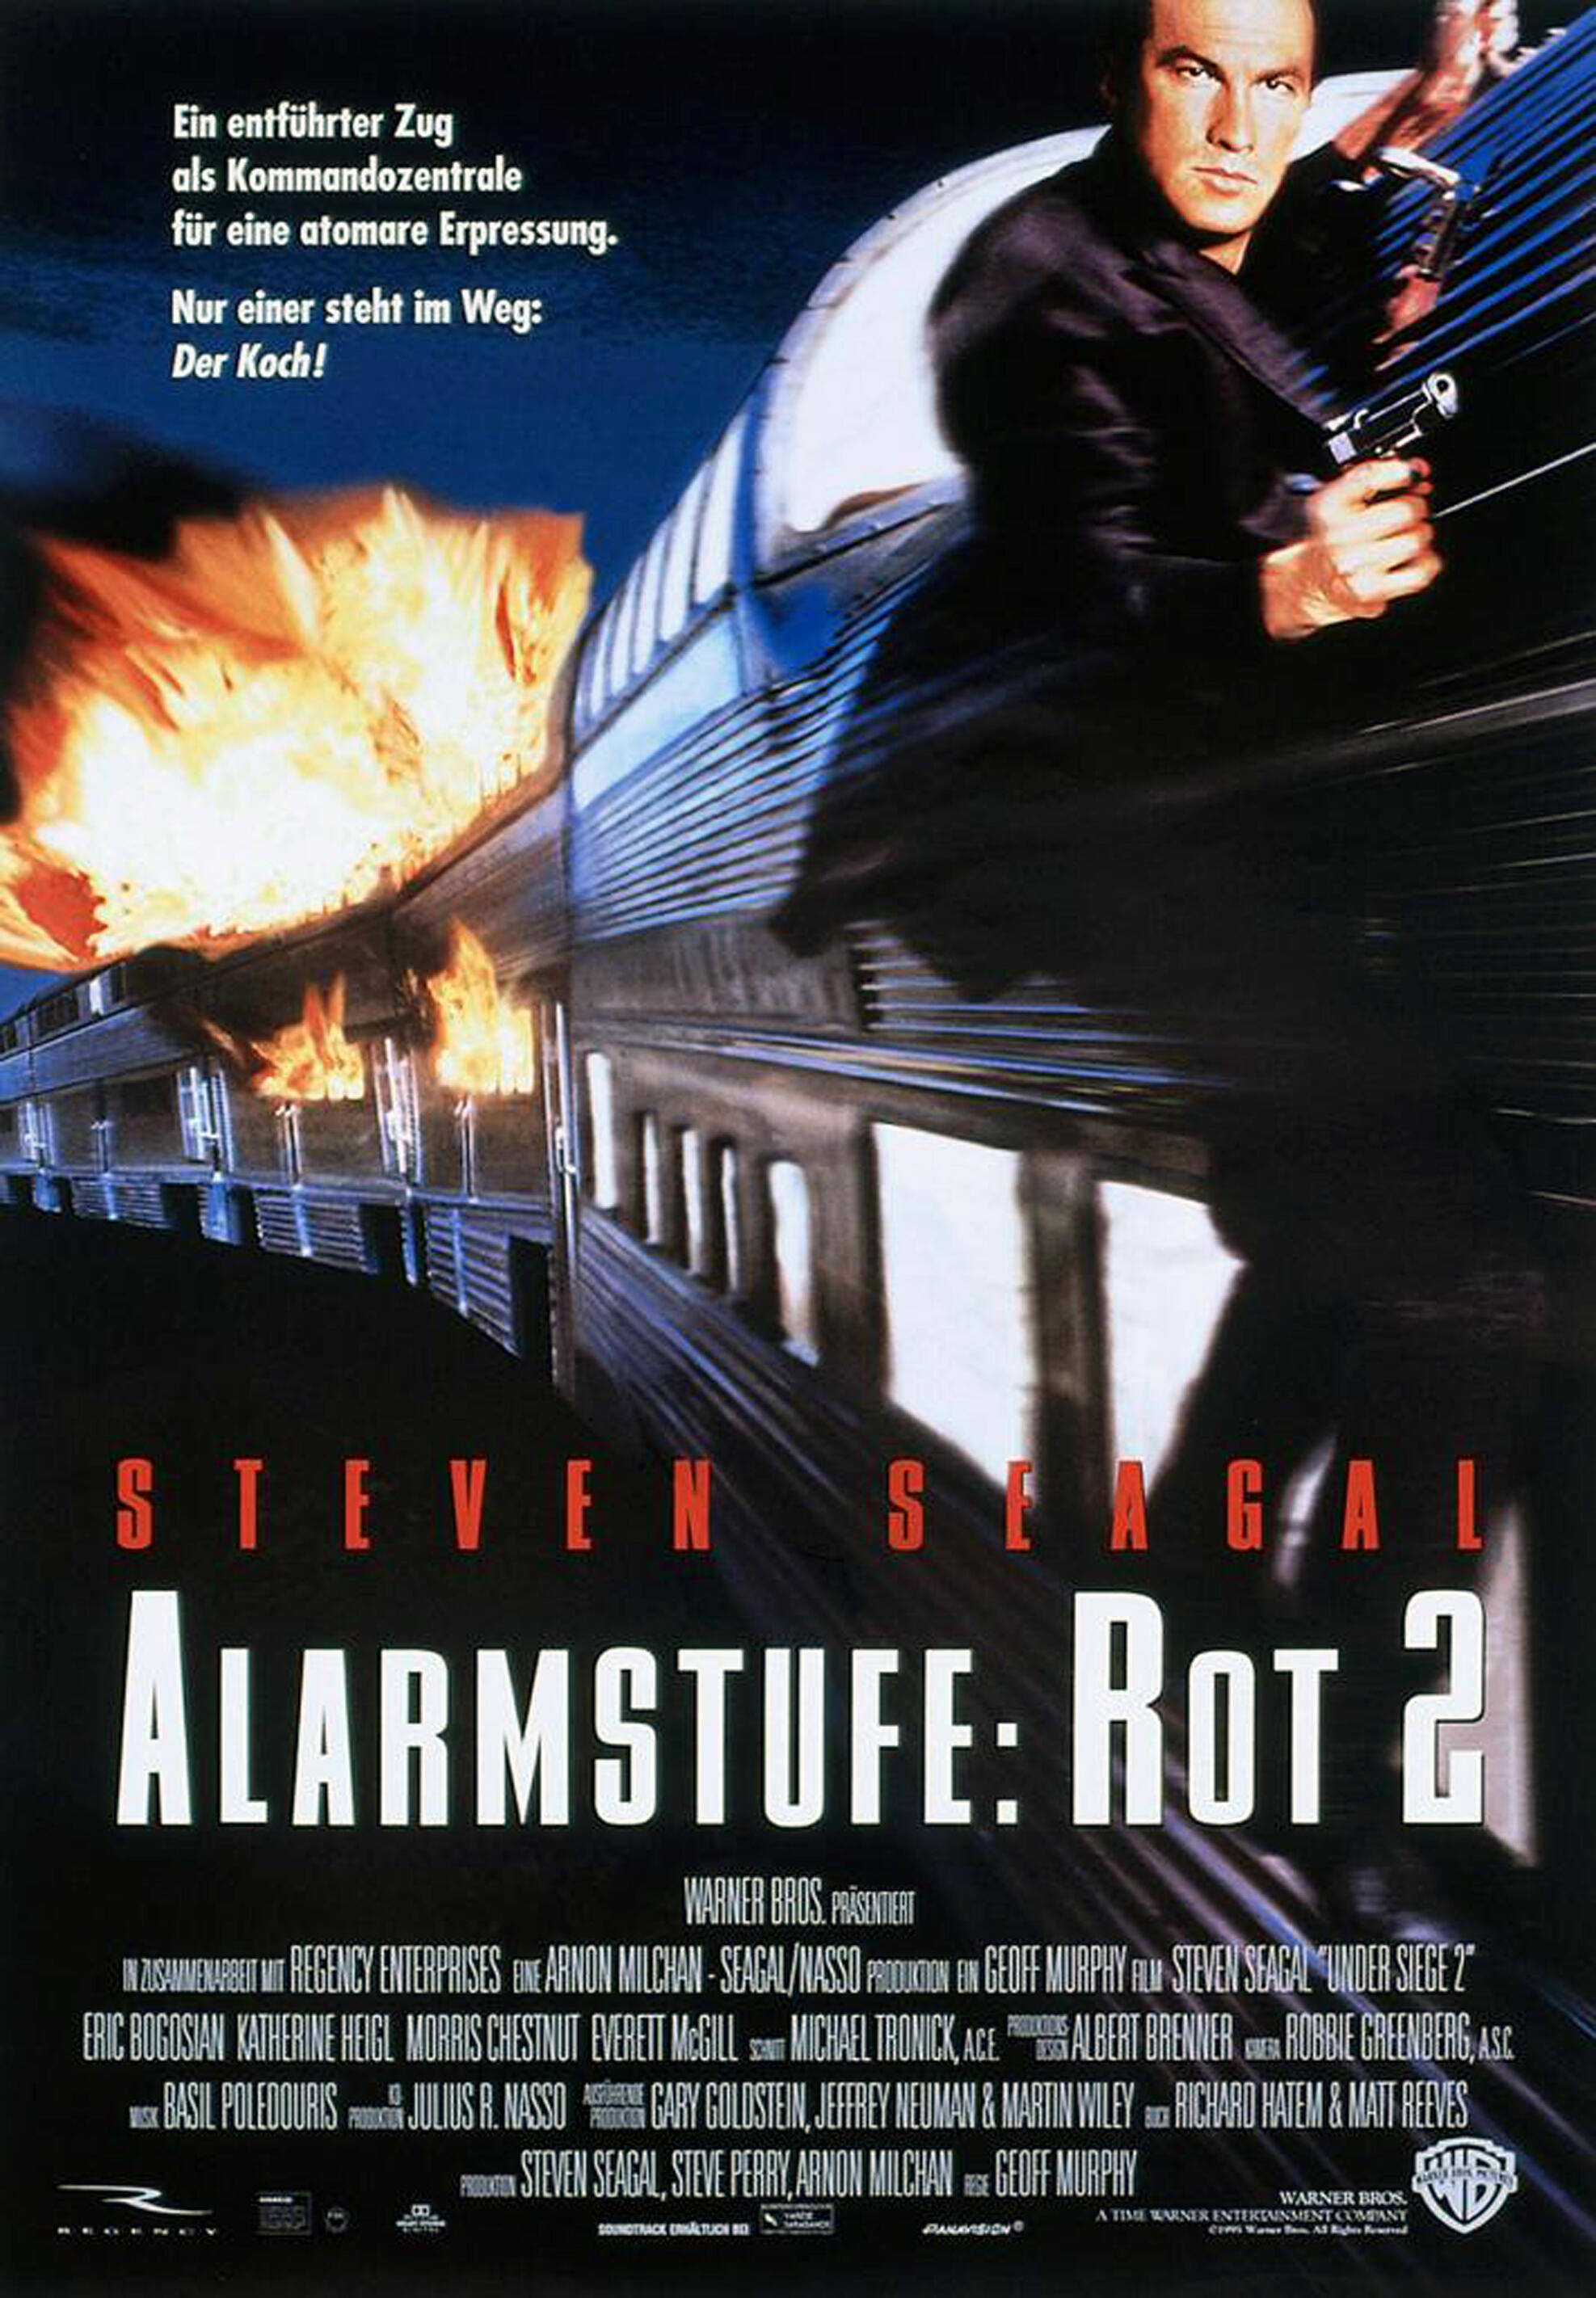 Alarmstufe Rot 2 Bild 2 Von 13 Moviepilot De